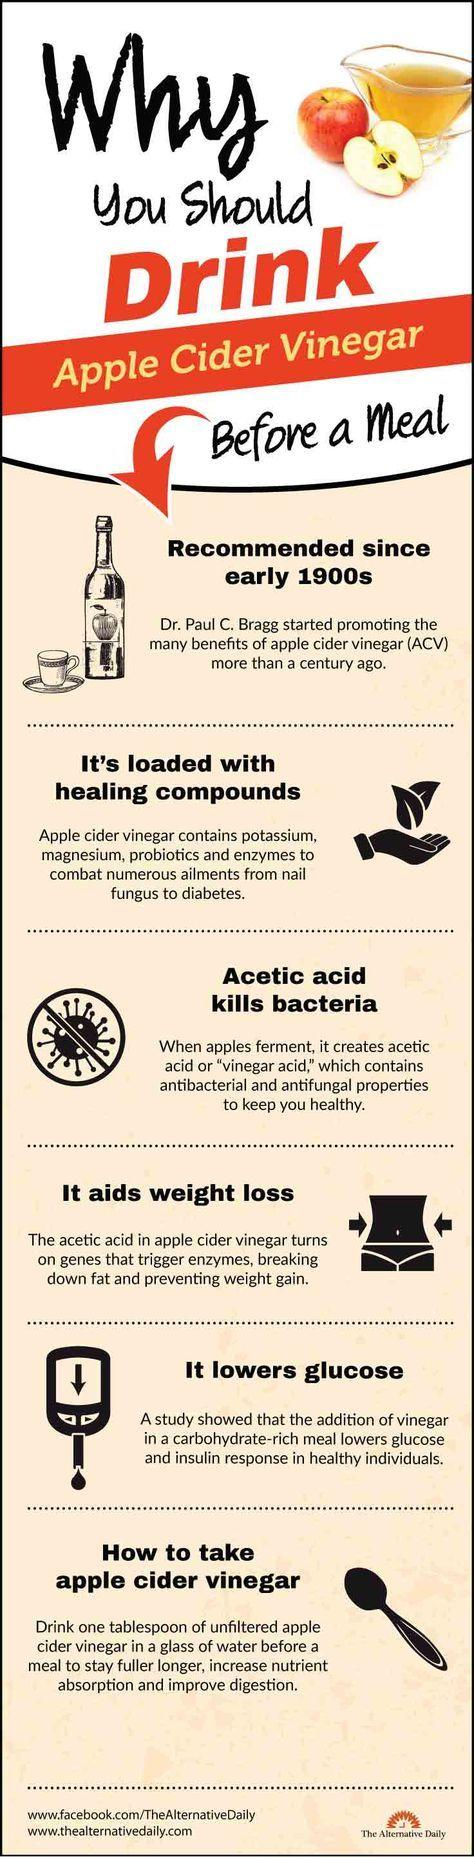 Why you should drink apple cider vinegar before a meal